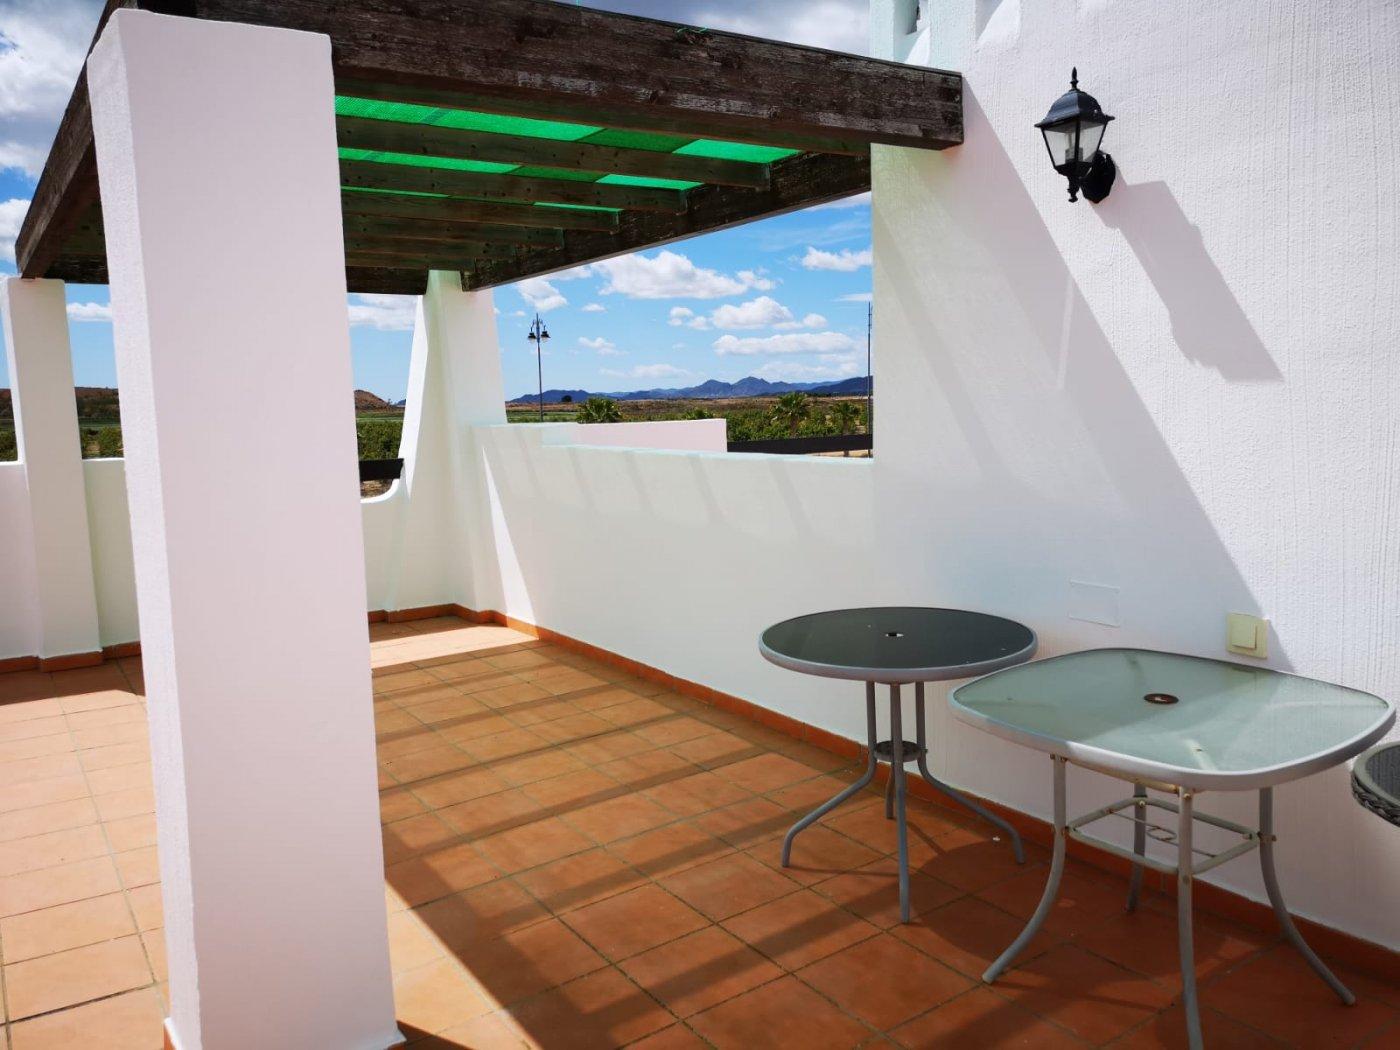 Gallery Image 28 of Key-Ready 2 Bedroom Apartment Overlooking the Citrus Groves in Jardin 10, Condado de Alhama